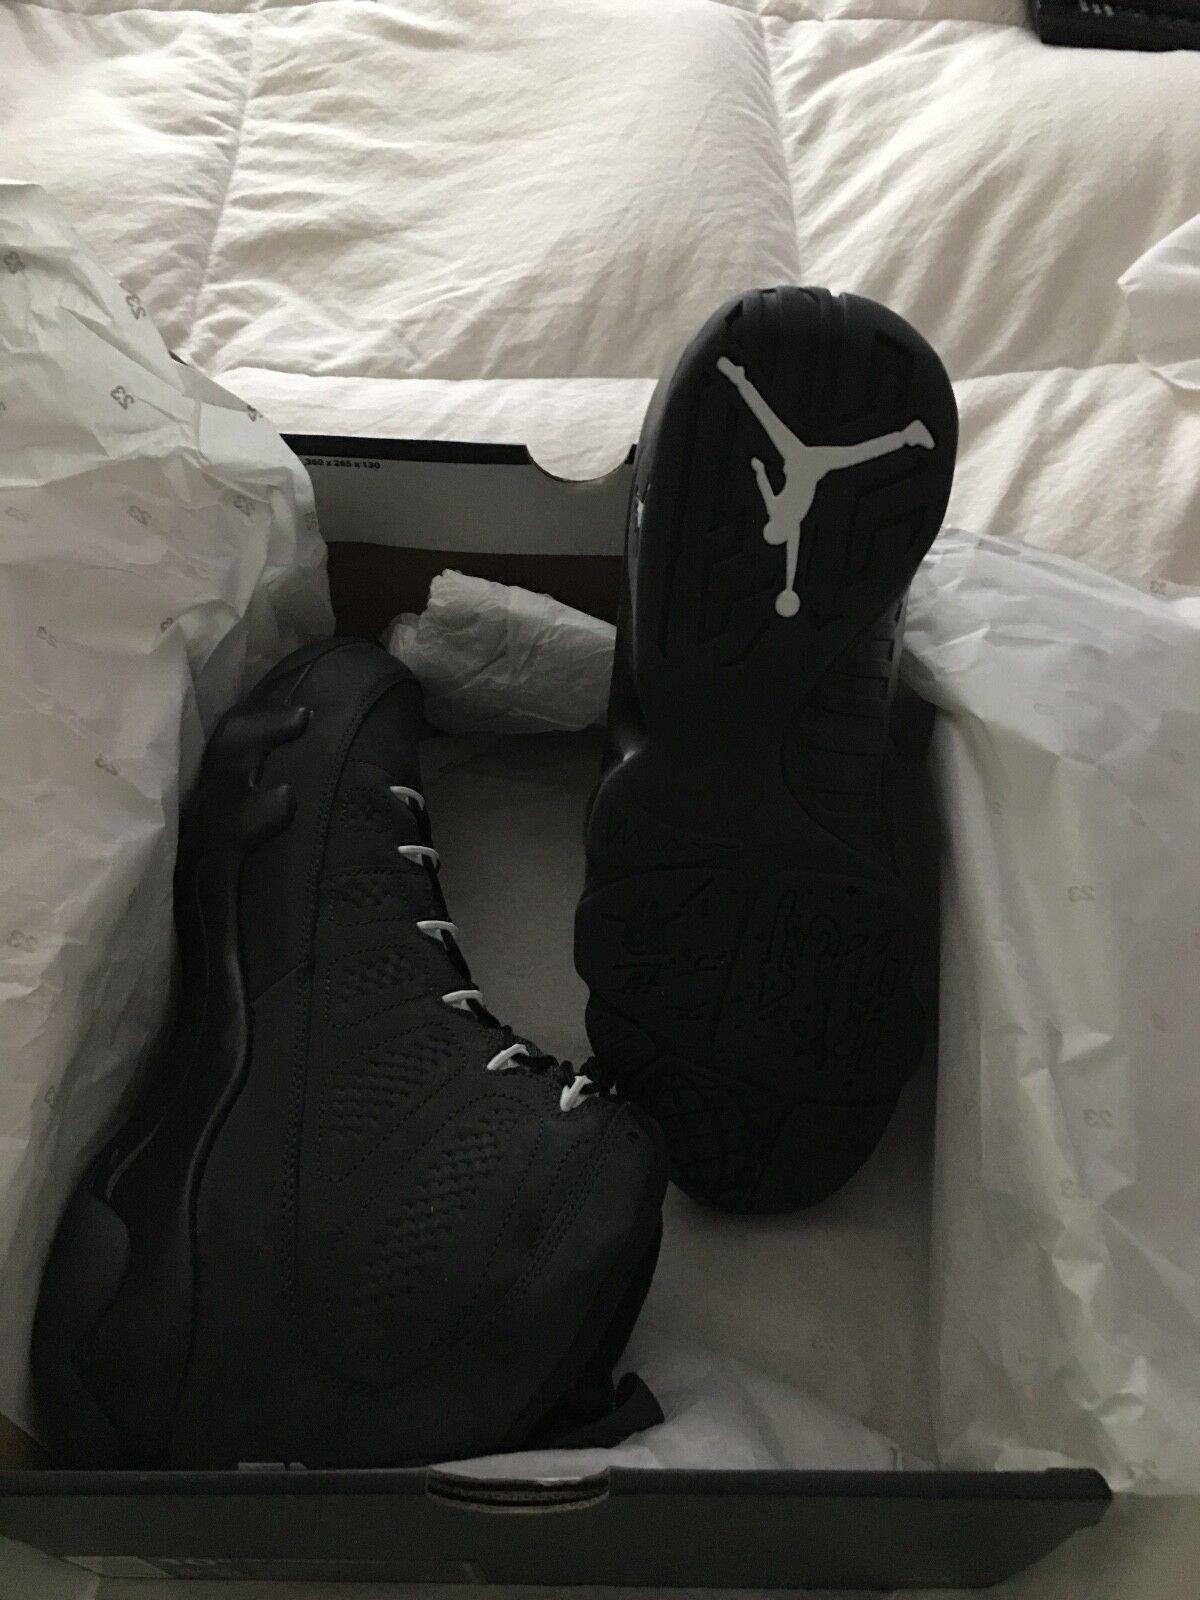 Brand new in the box Authentic retro Jordan 9, size 10.5